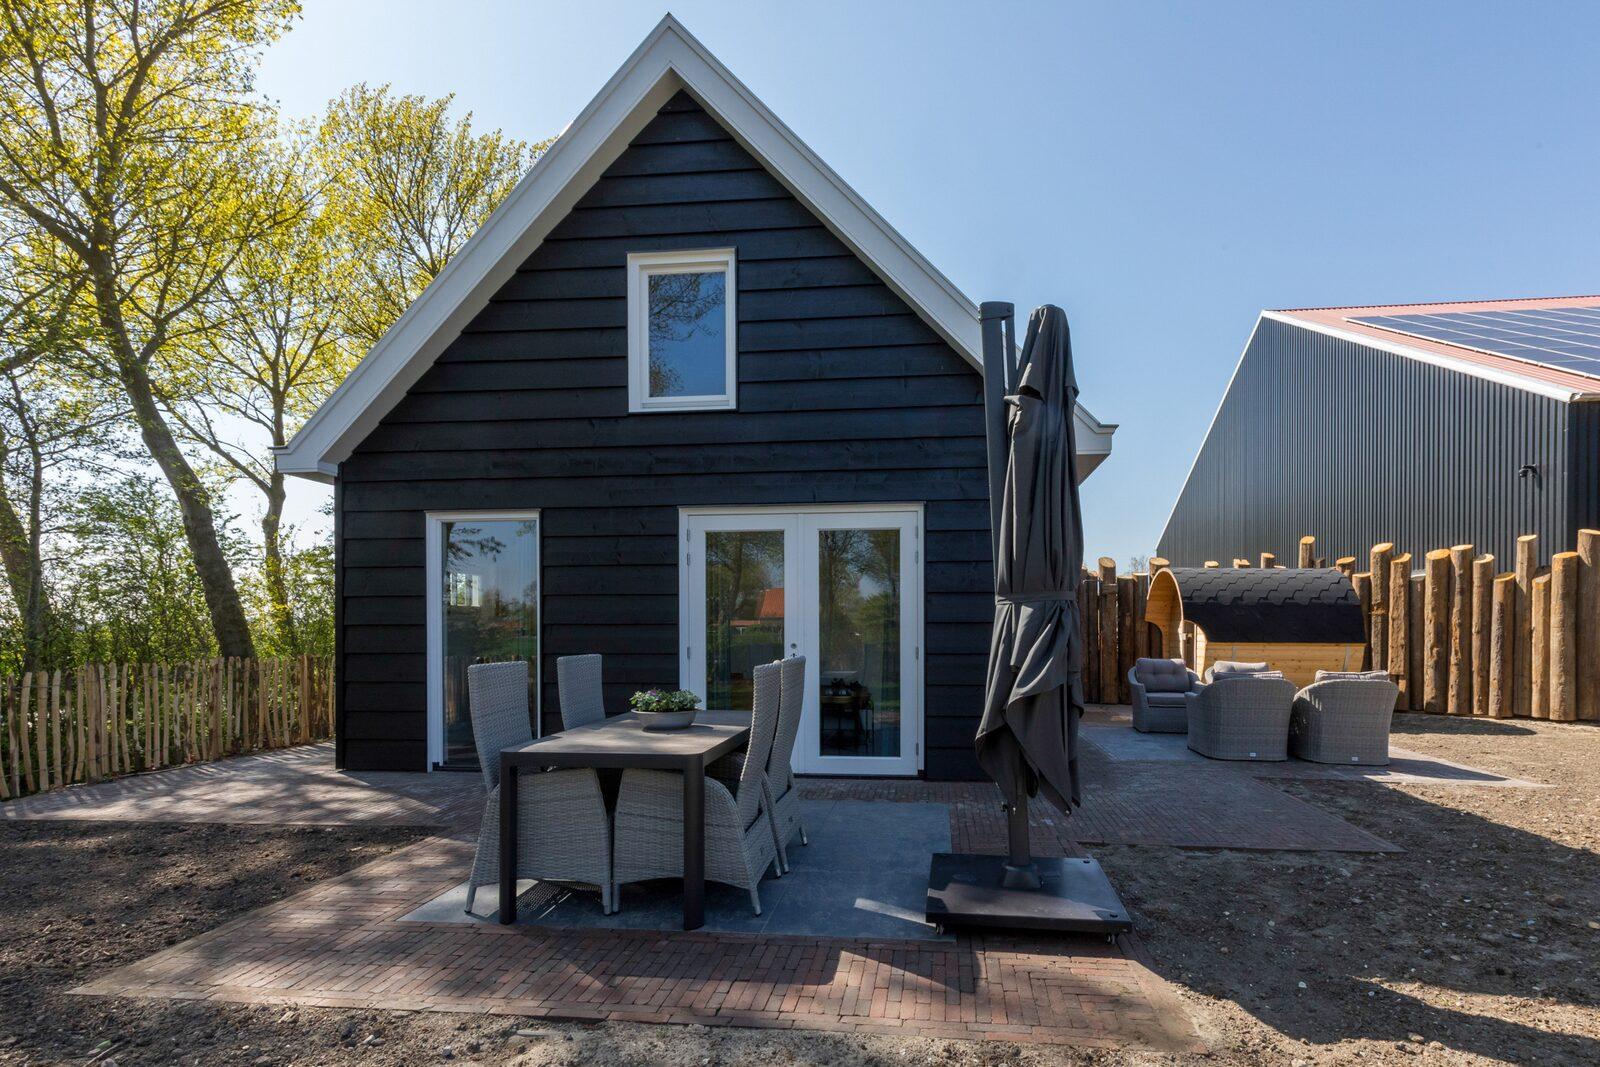 Holidayhouse - Lepelstraat 18c | Vrouwenpolder